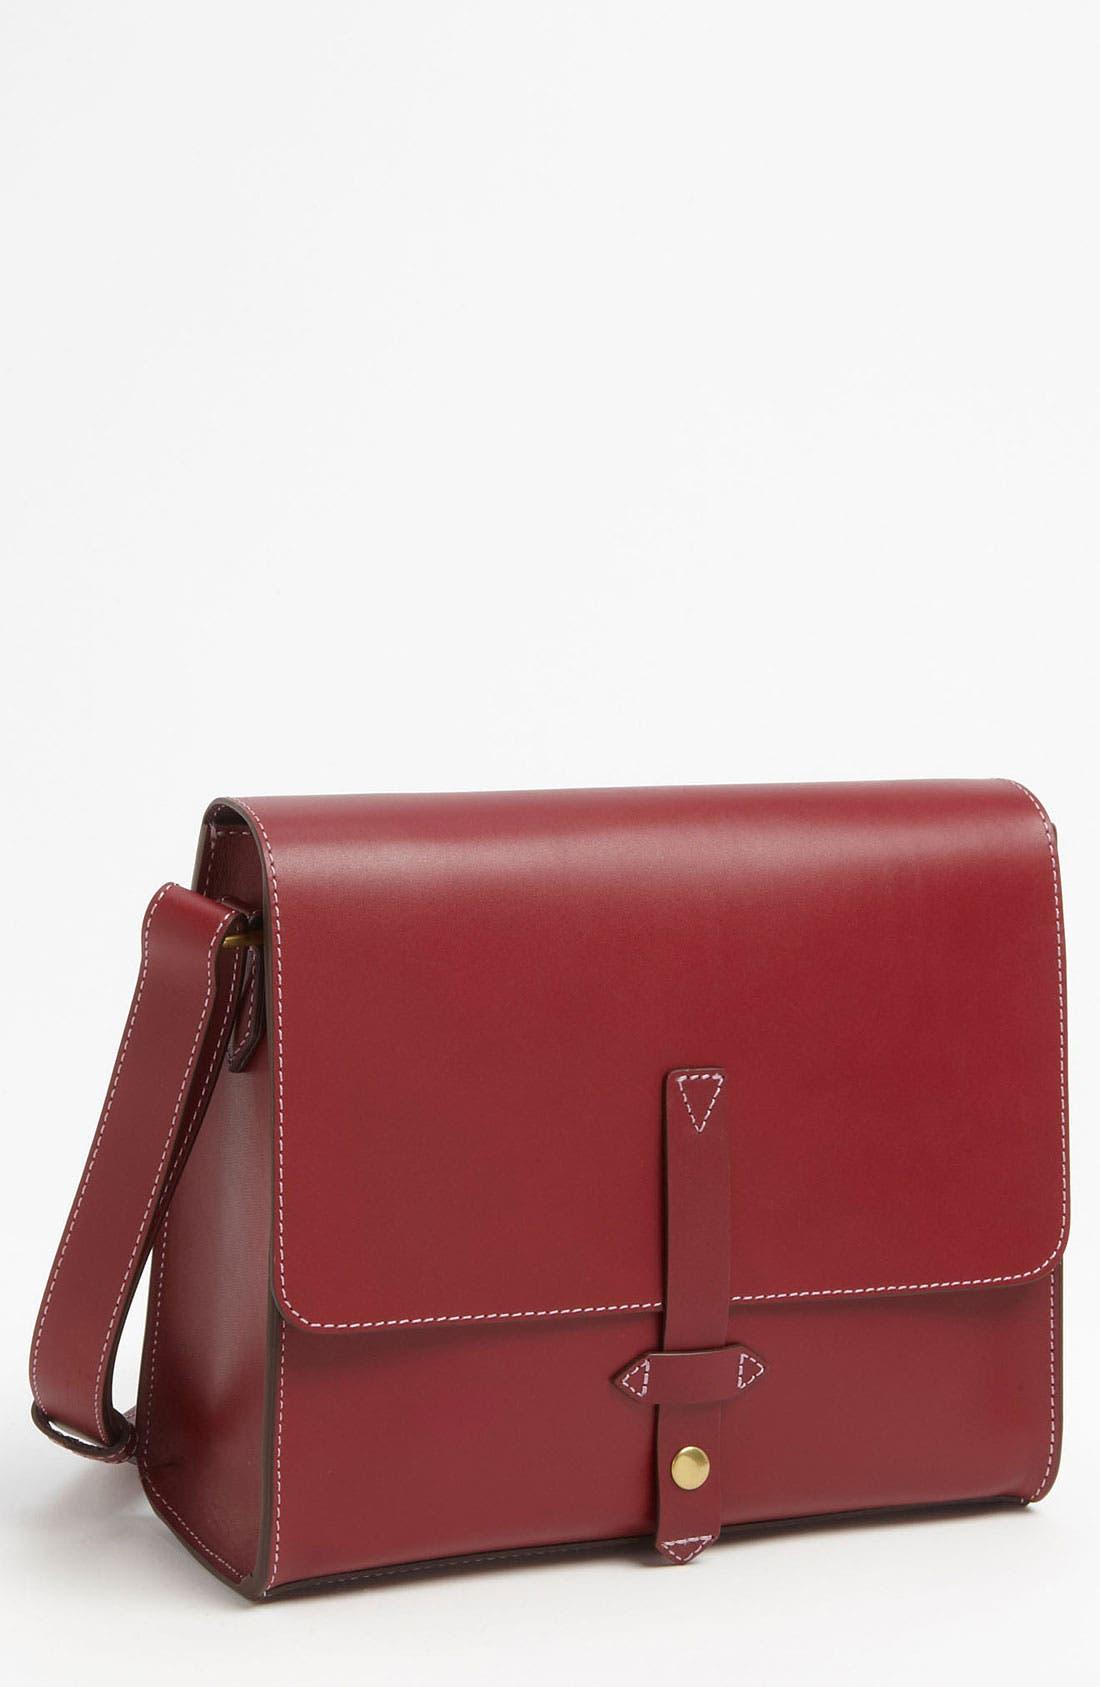 Main Image - IIIBeCa By Joy Gryson 'Duane' Crossbody Bag